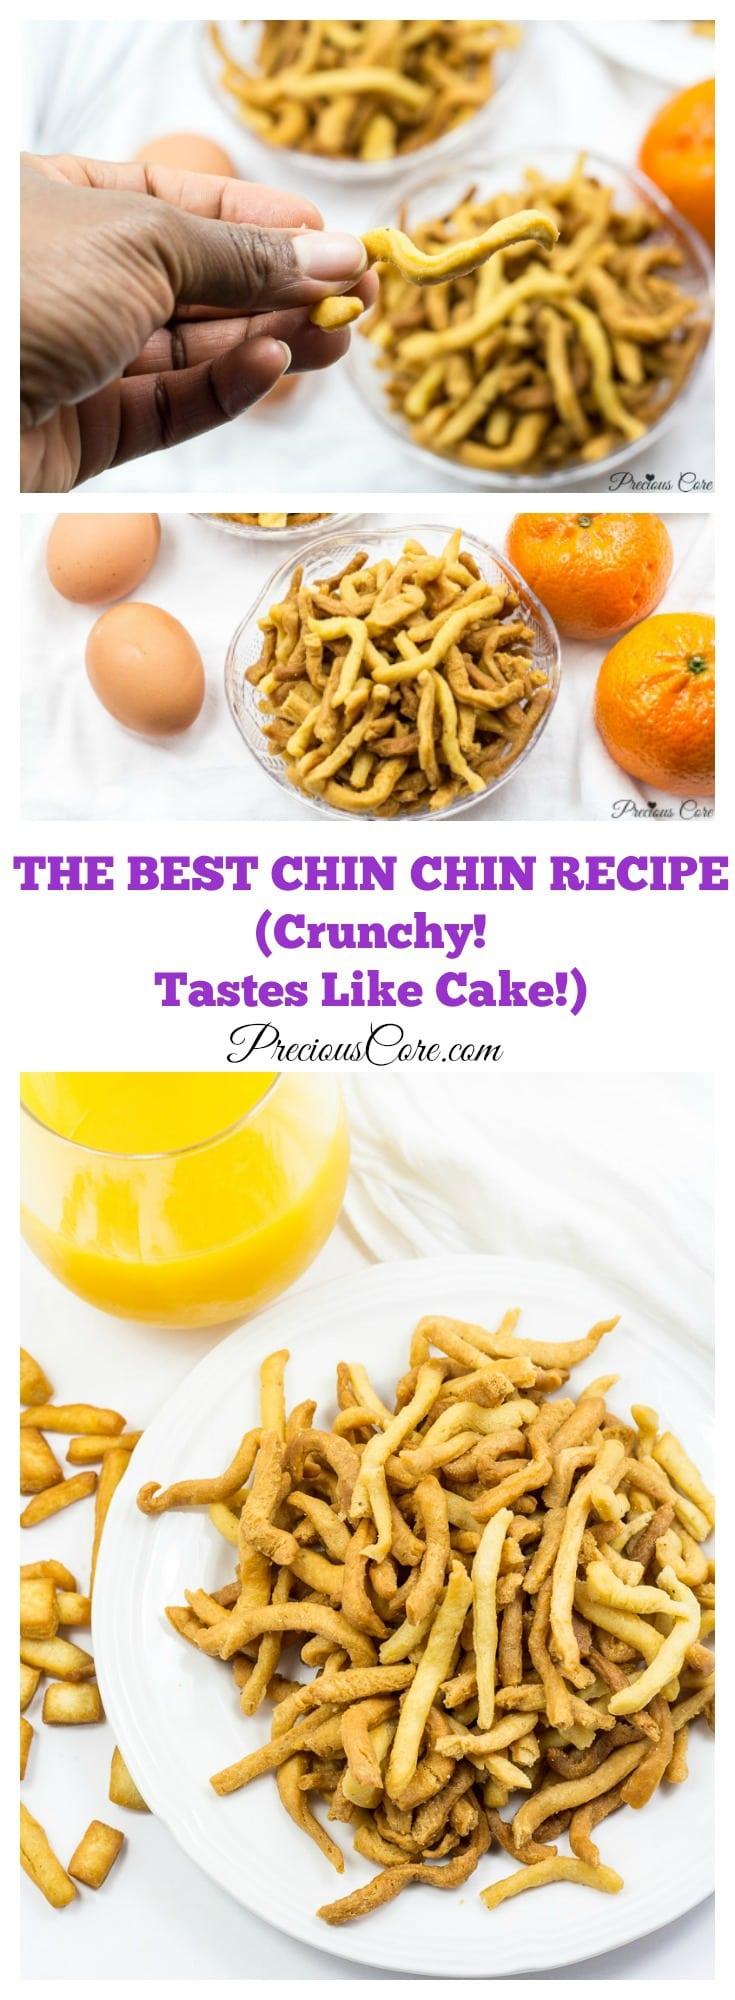 Cameroonian chin chin recipe